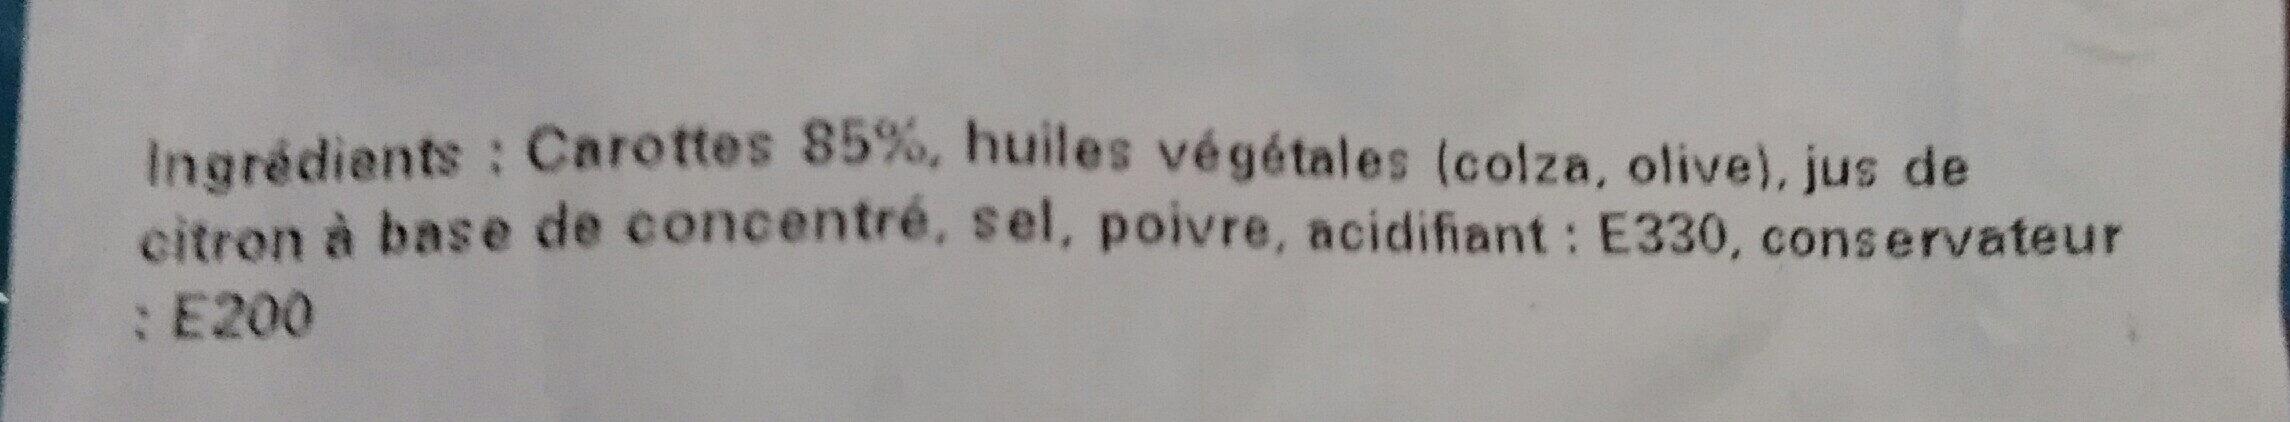 Tagliatelles de carottes ESV - Ingredients - fr